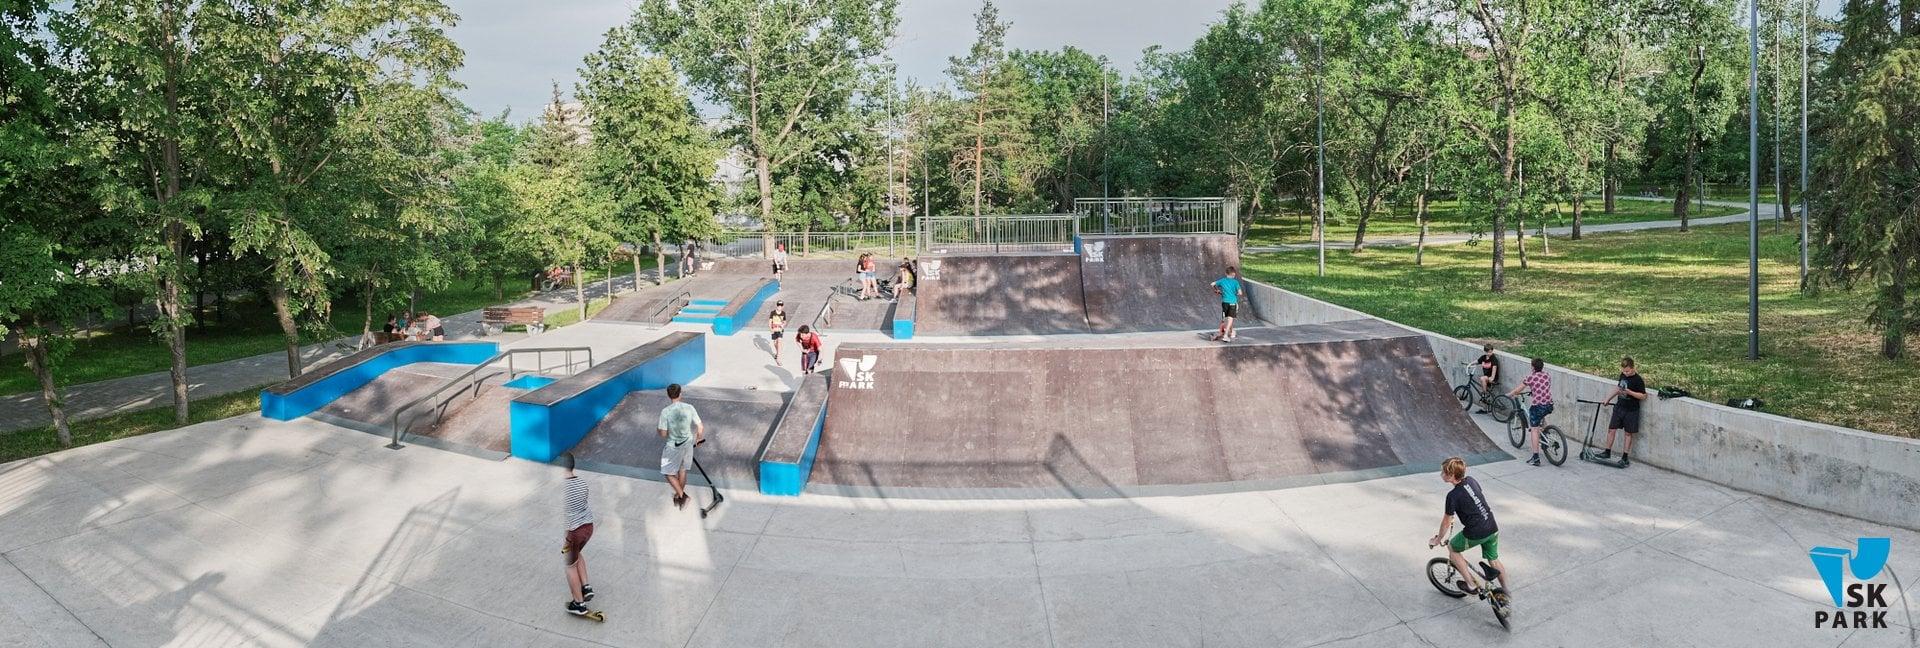 Cкейт парк в Белой Калитве / Skatepark in Belaya Kalitva